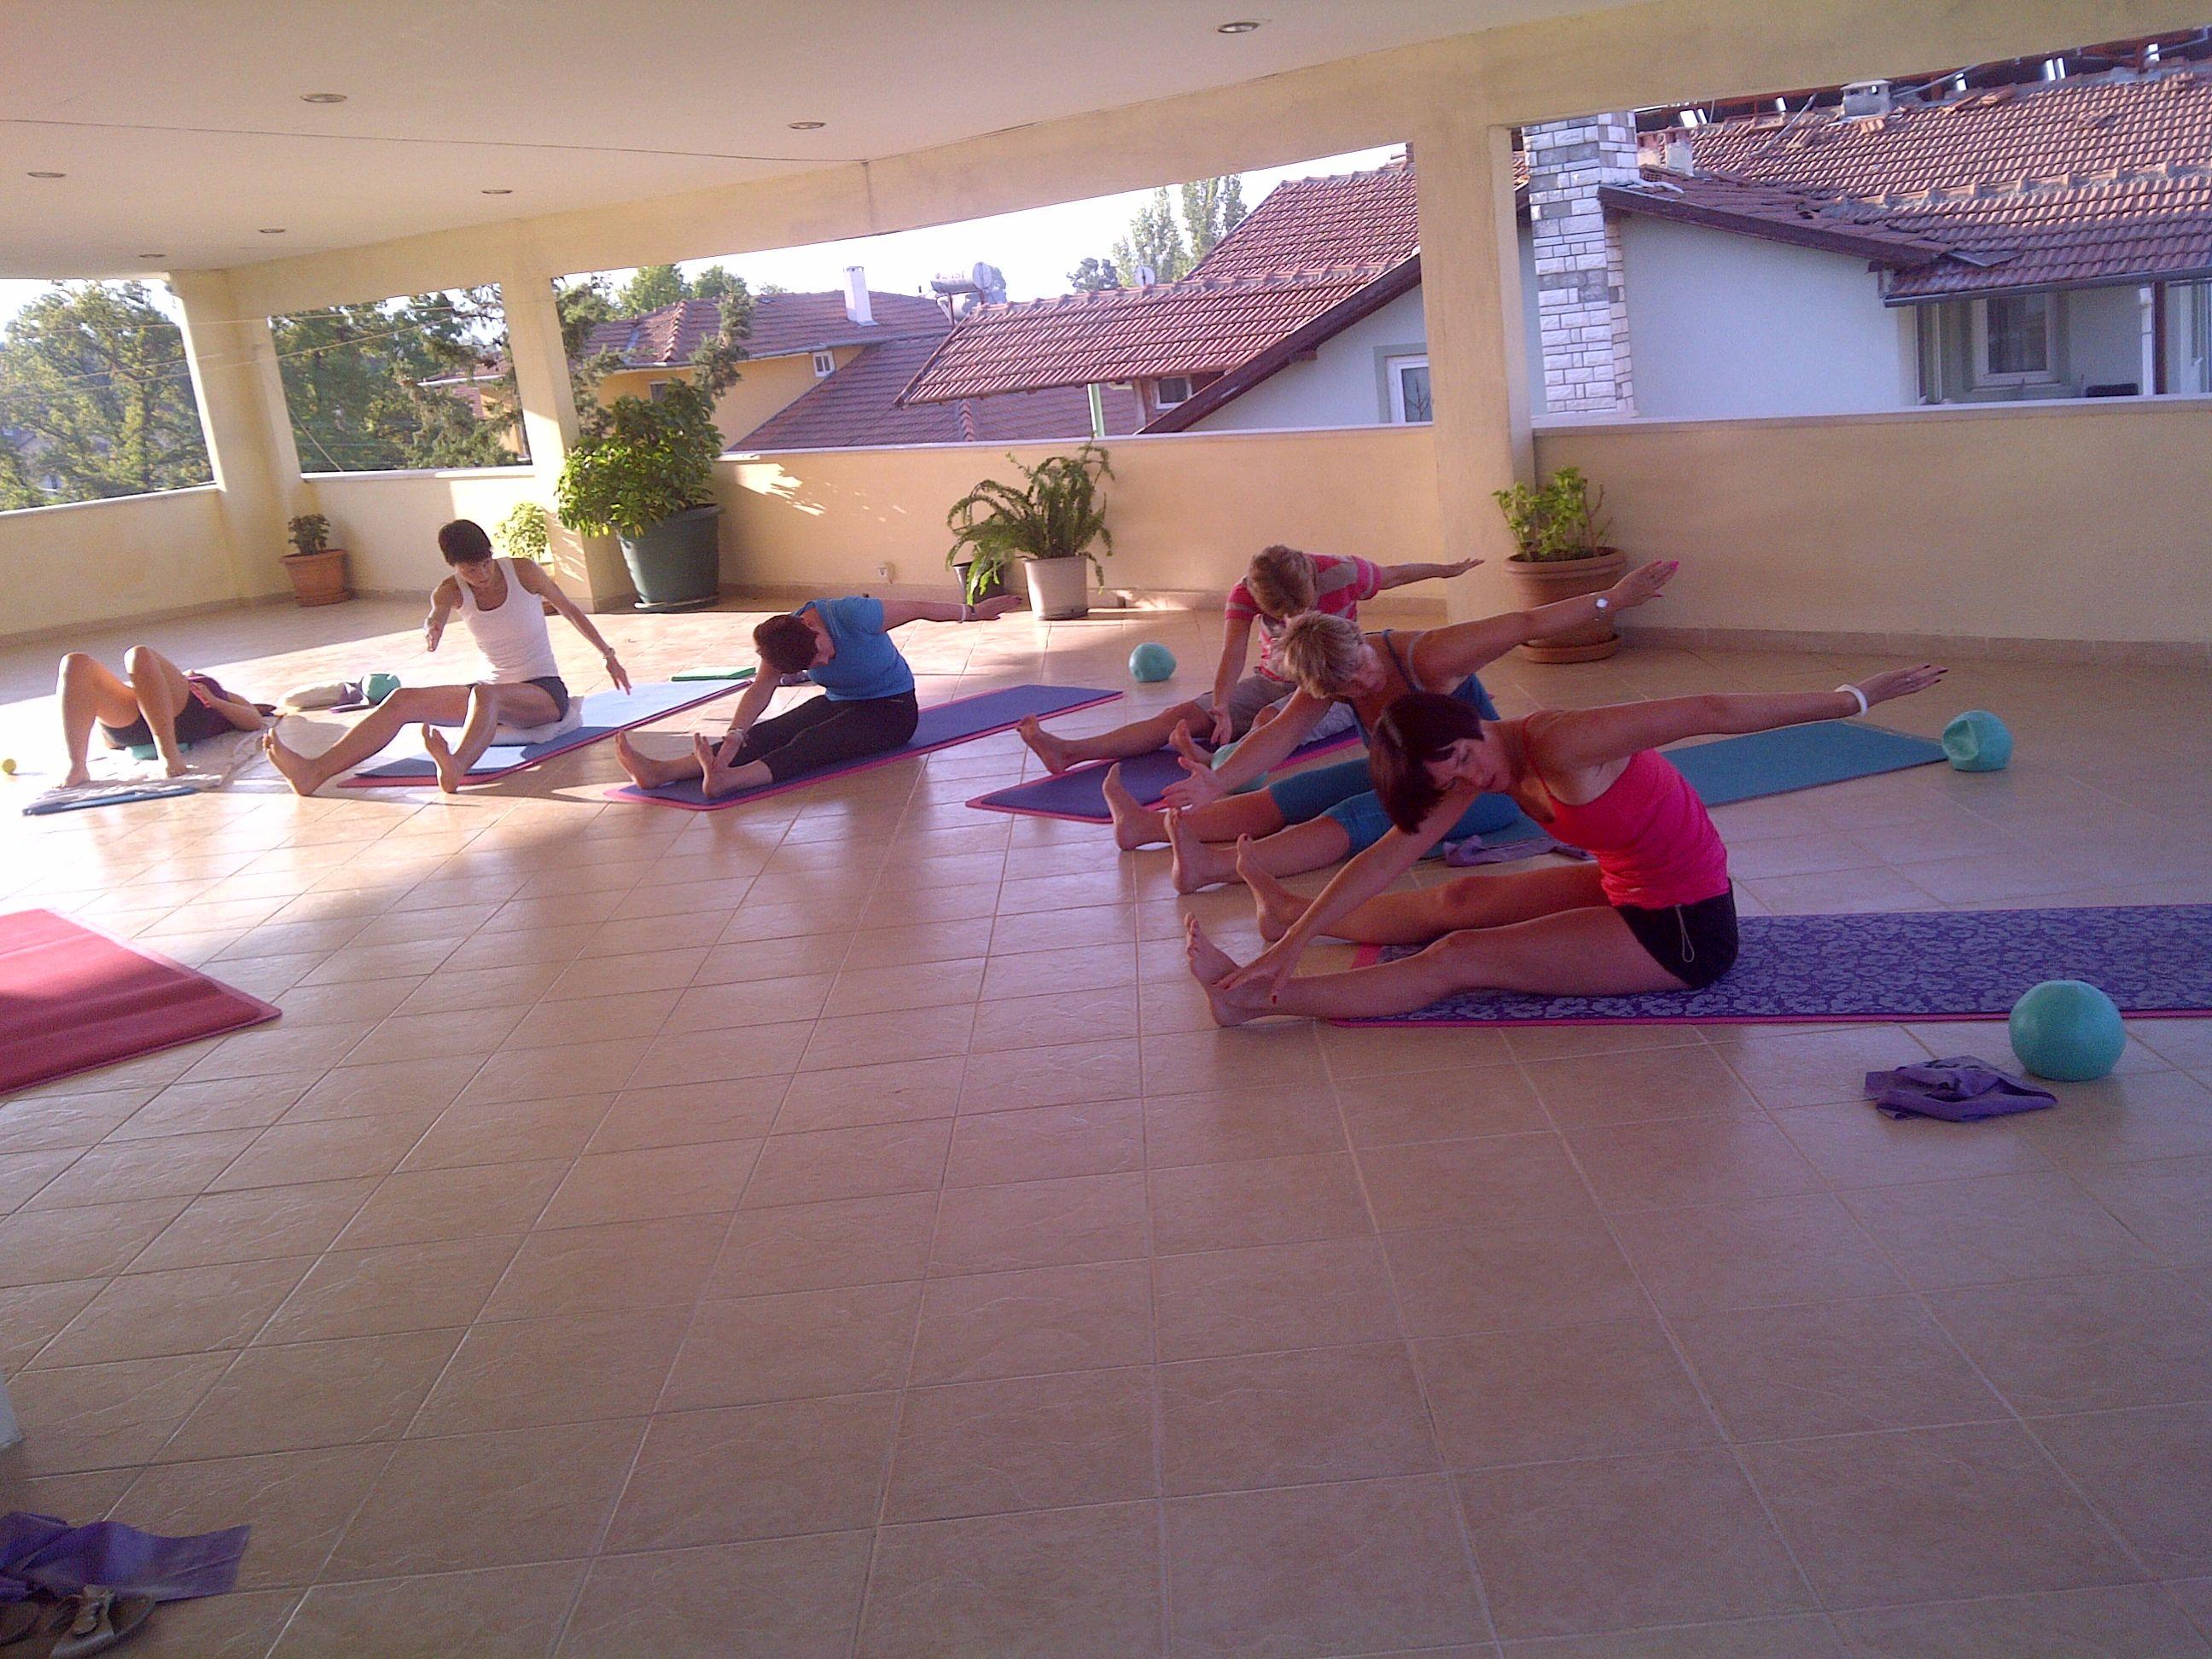 Pilates classes running balham library hall monday am